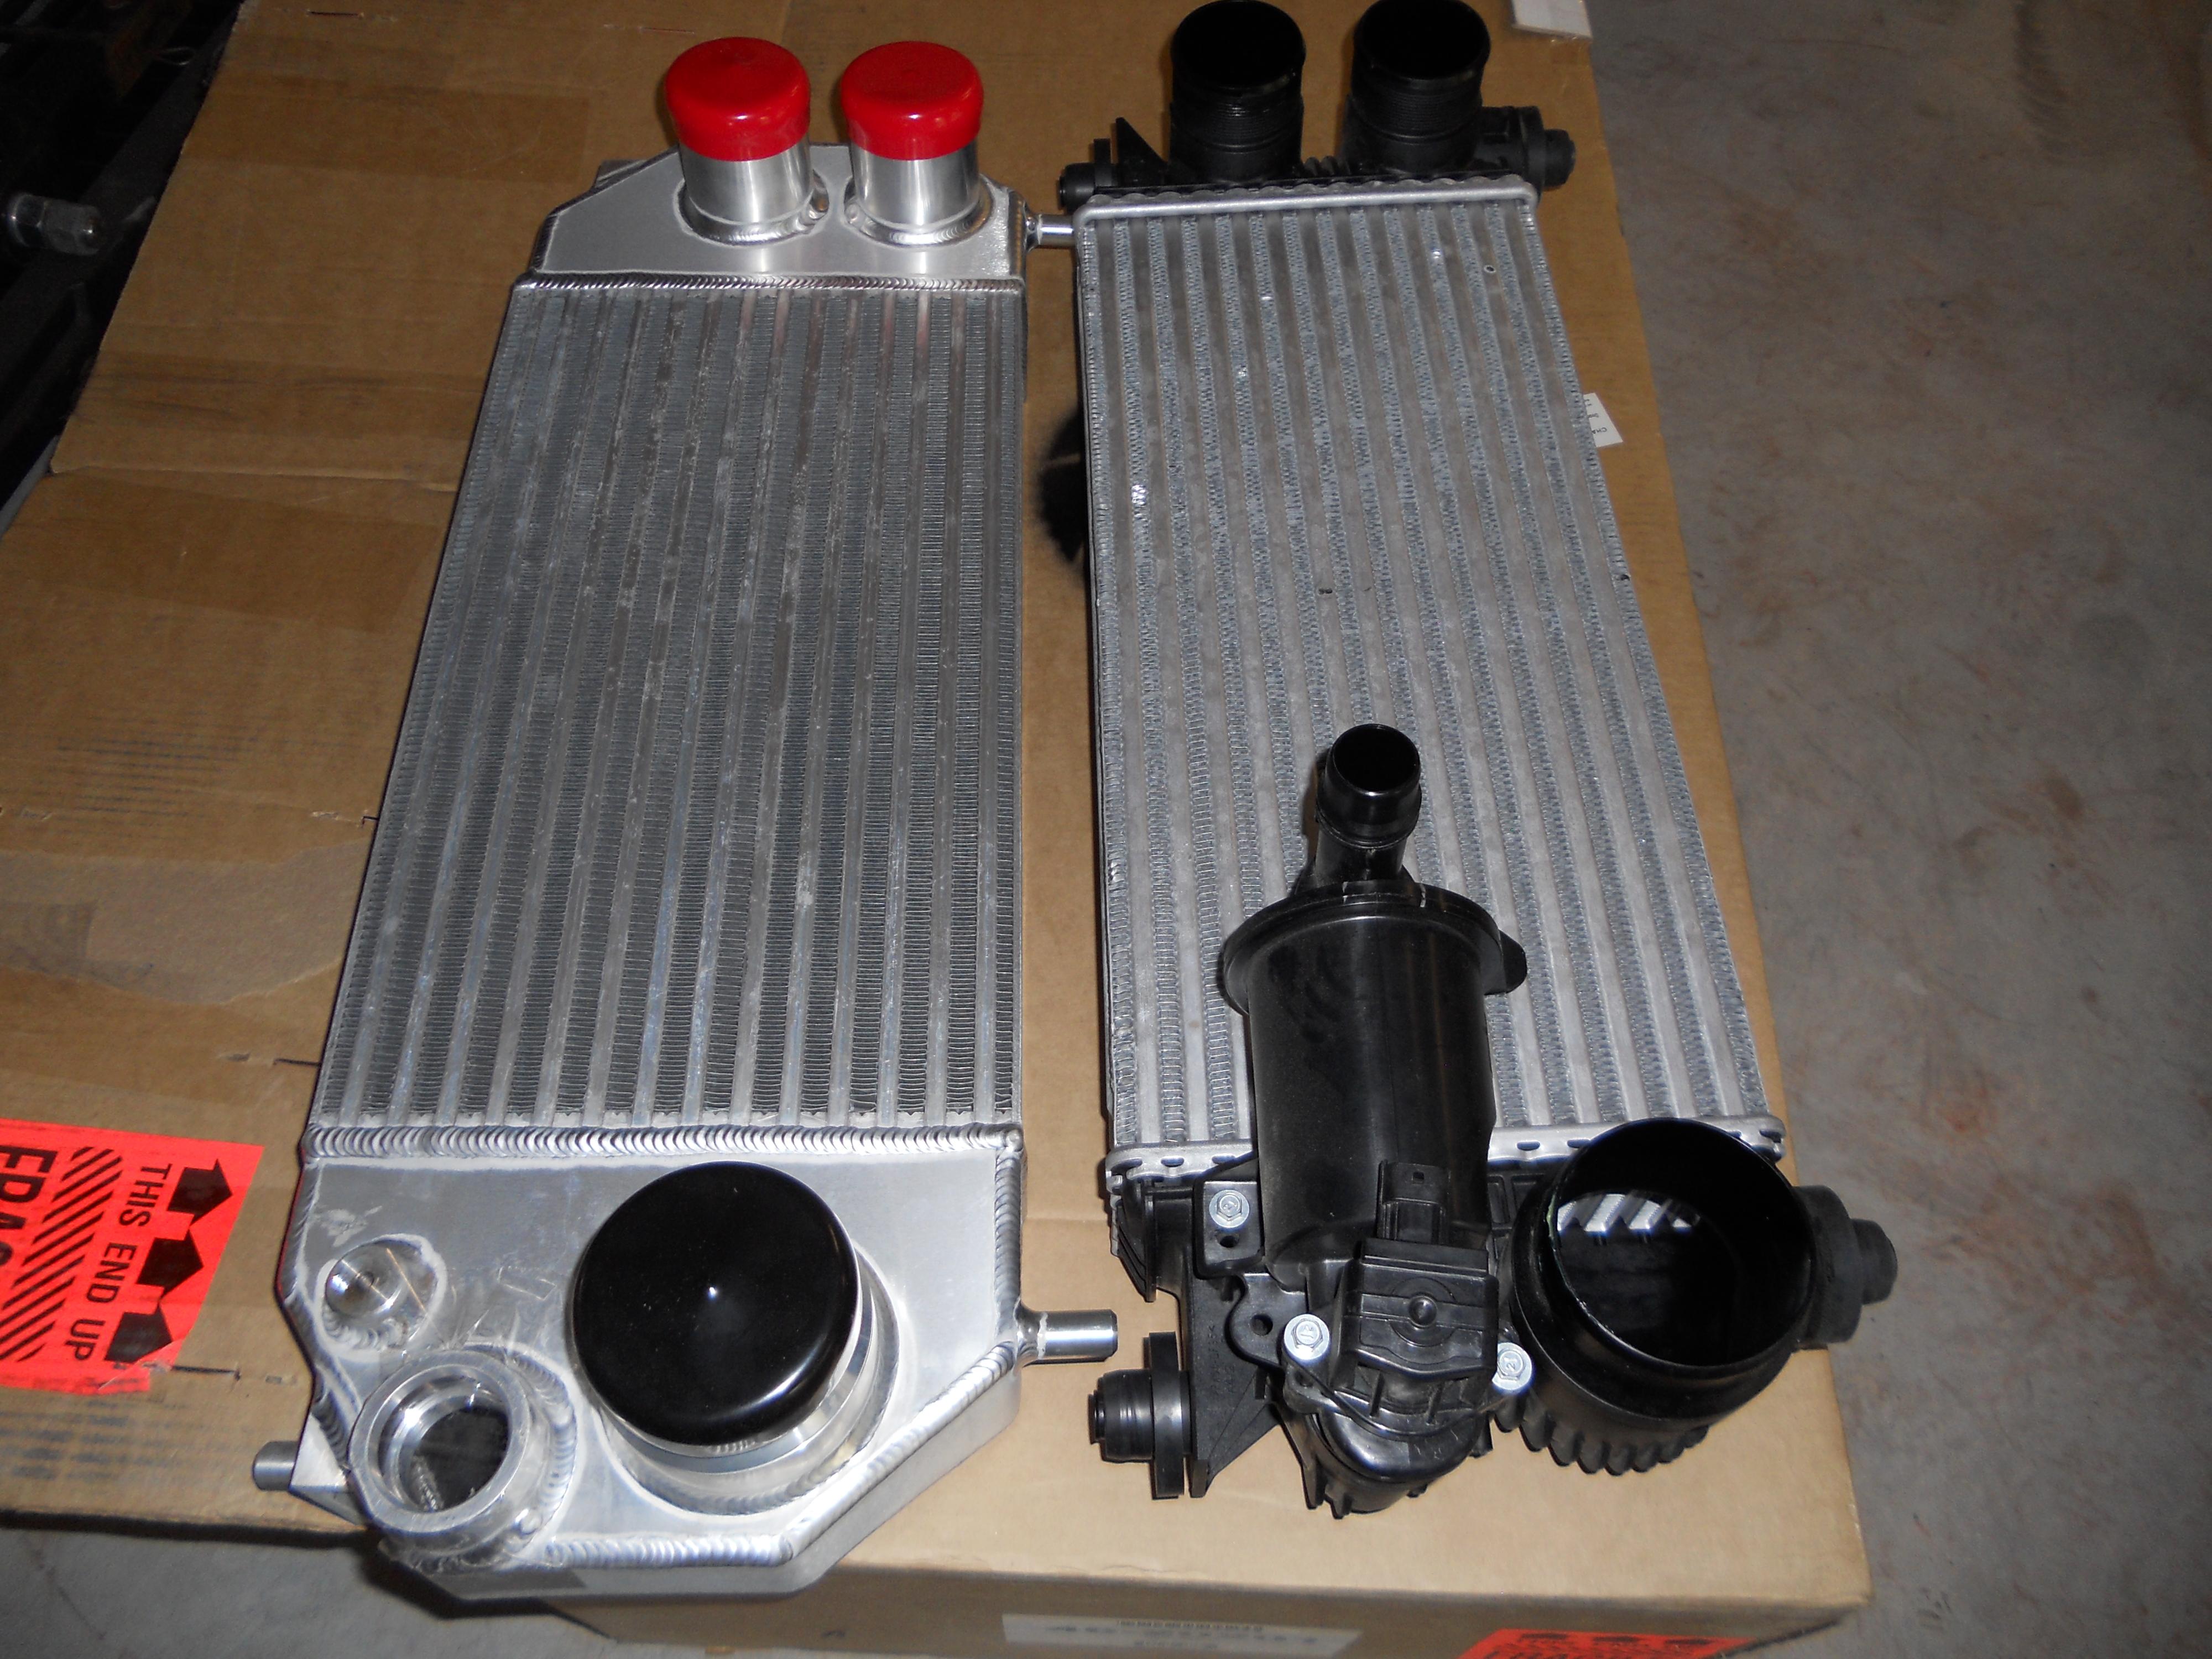 2016 Ford Explorer Sport For Sale >> 2015-2016 F150 3.5L Ecoboost AFE Intercooler Install - 5 Star Tuning